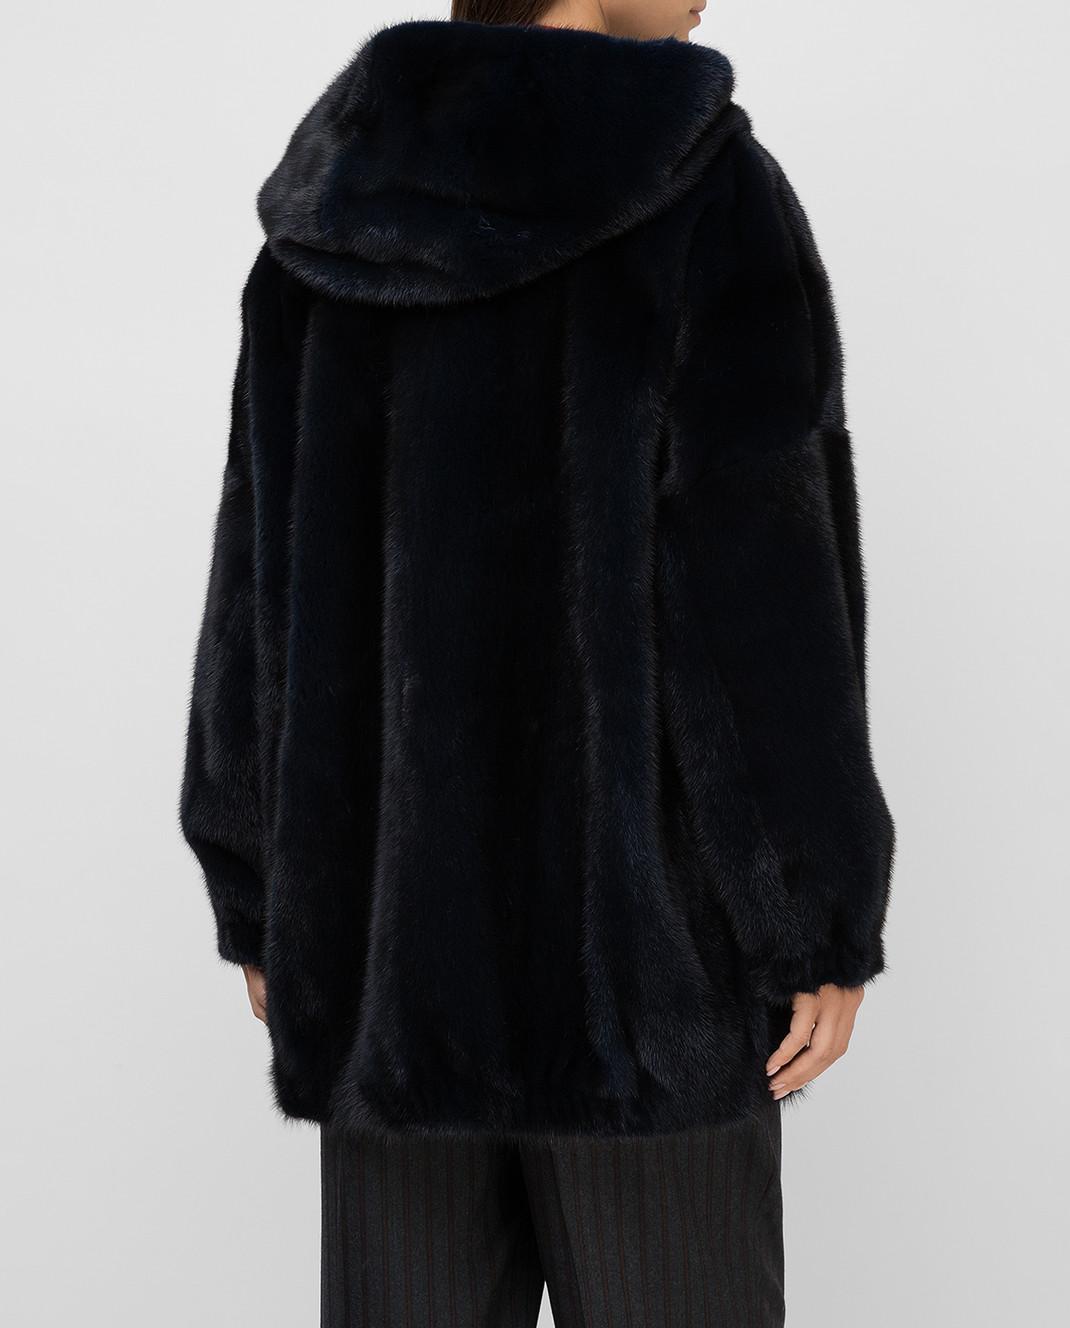 Florence Mode Темно-синяя шуба из меха норки изображение 4